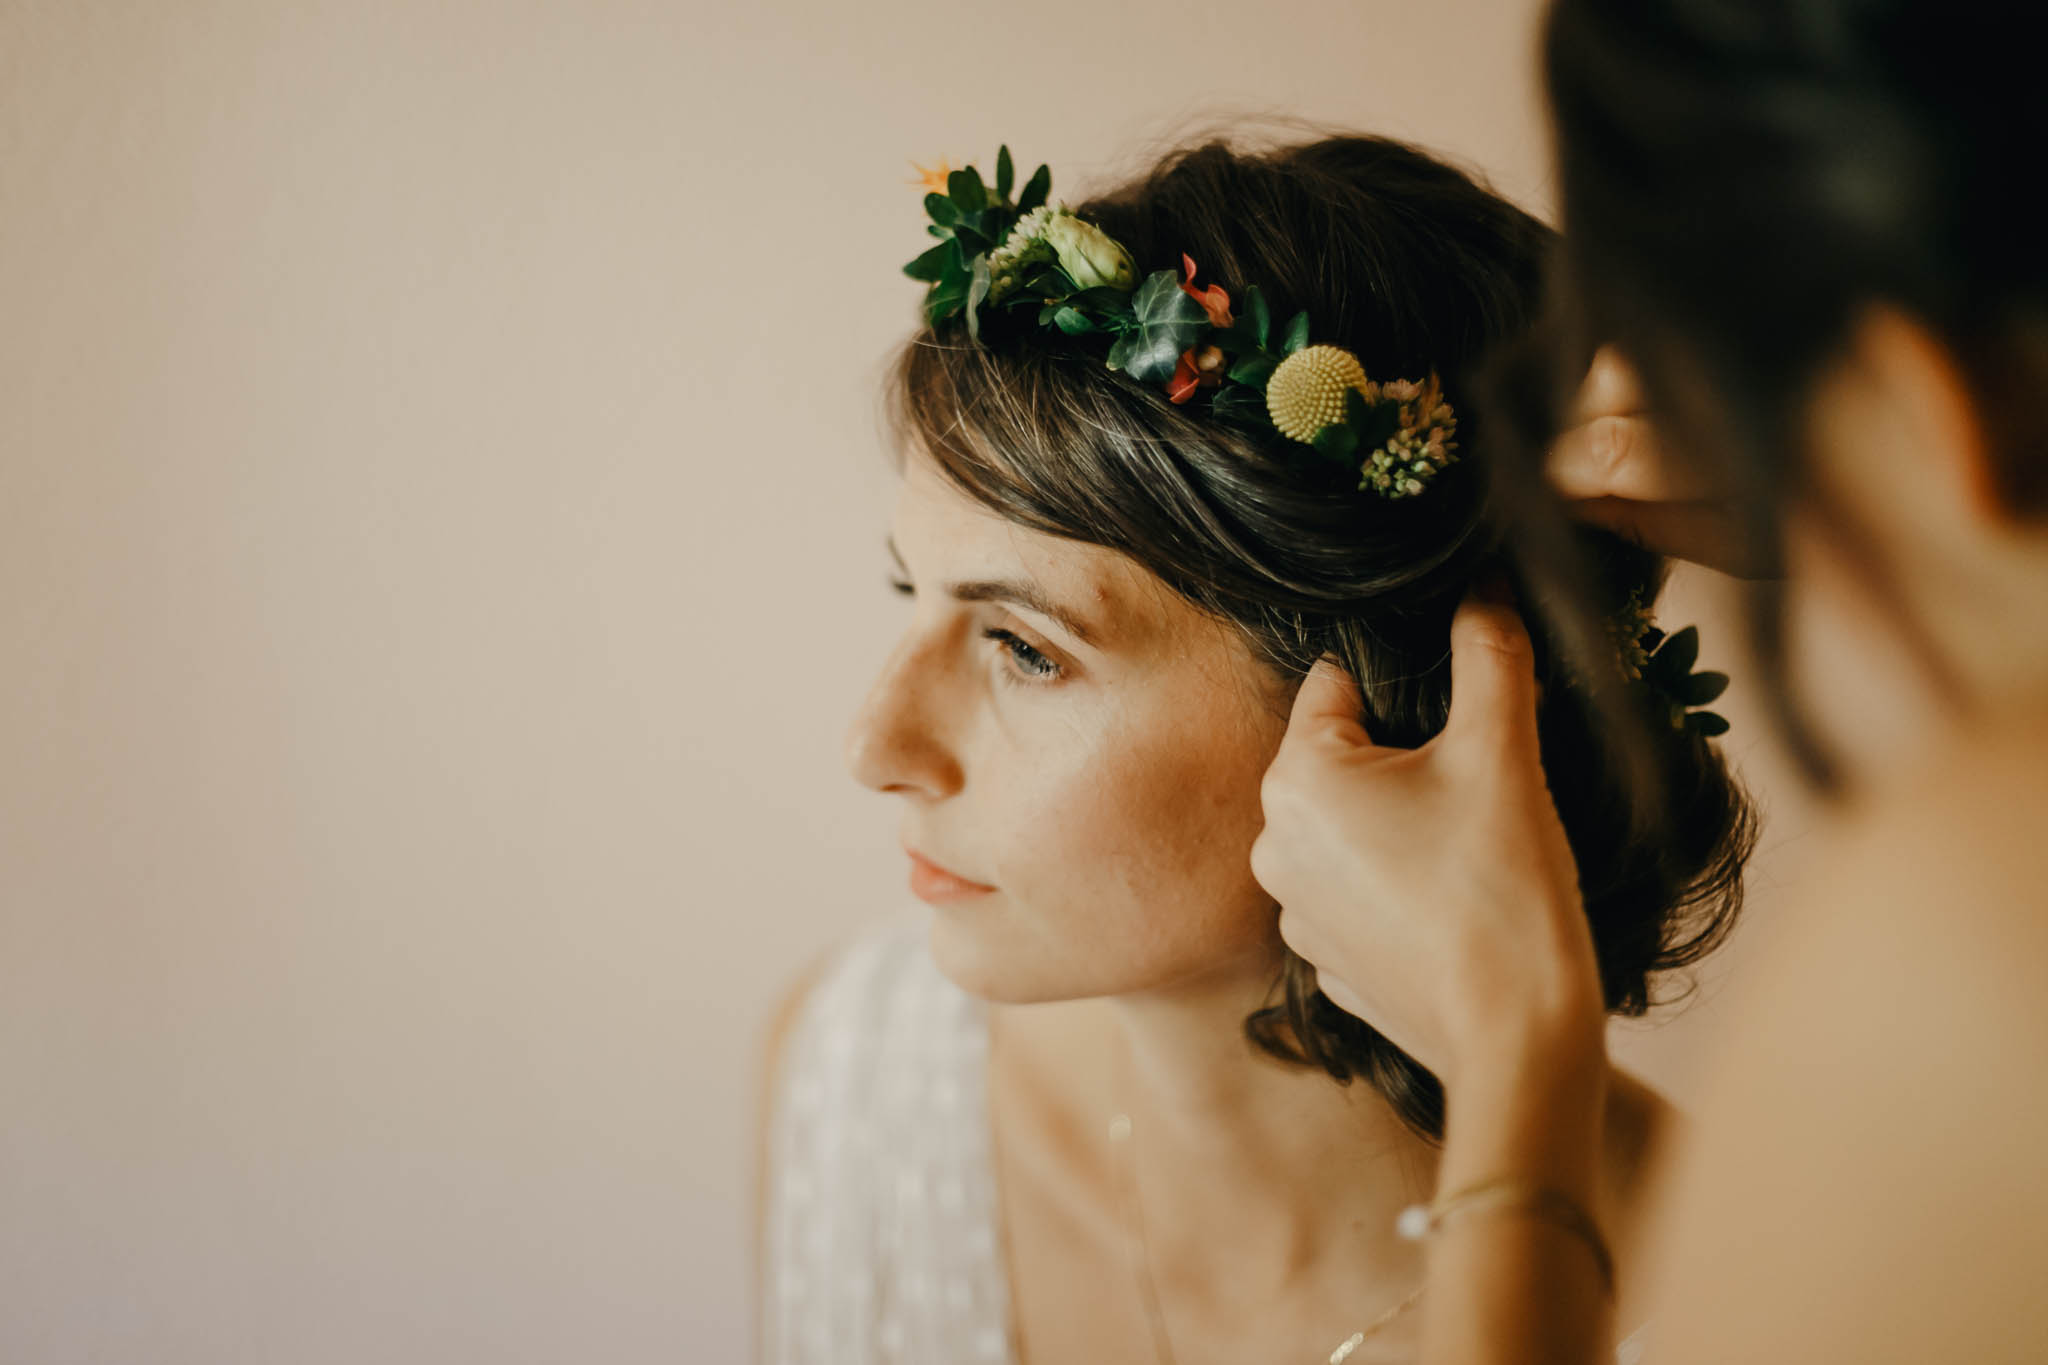 mariage-preparatifs-cantal-ingold-177.jpg